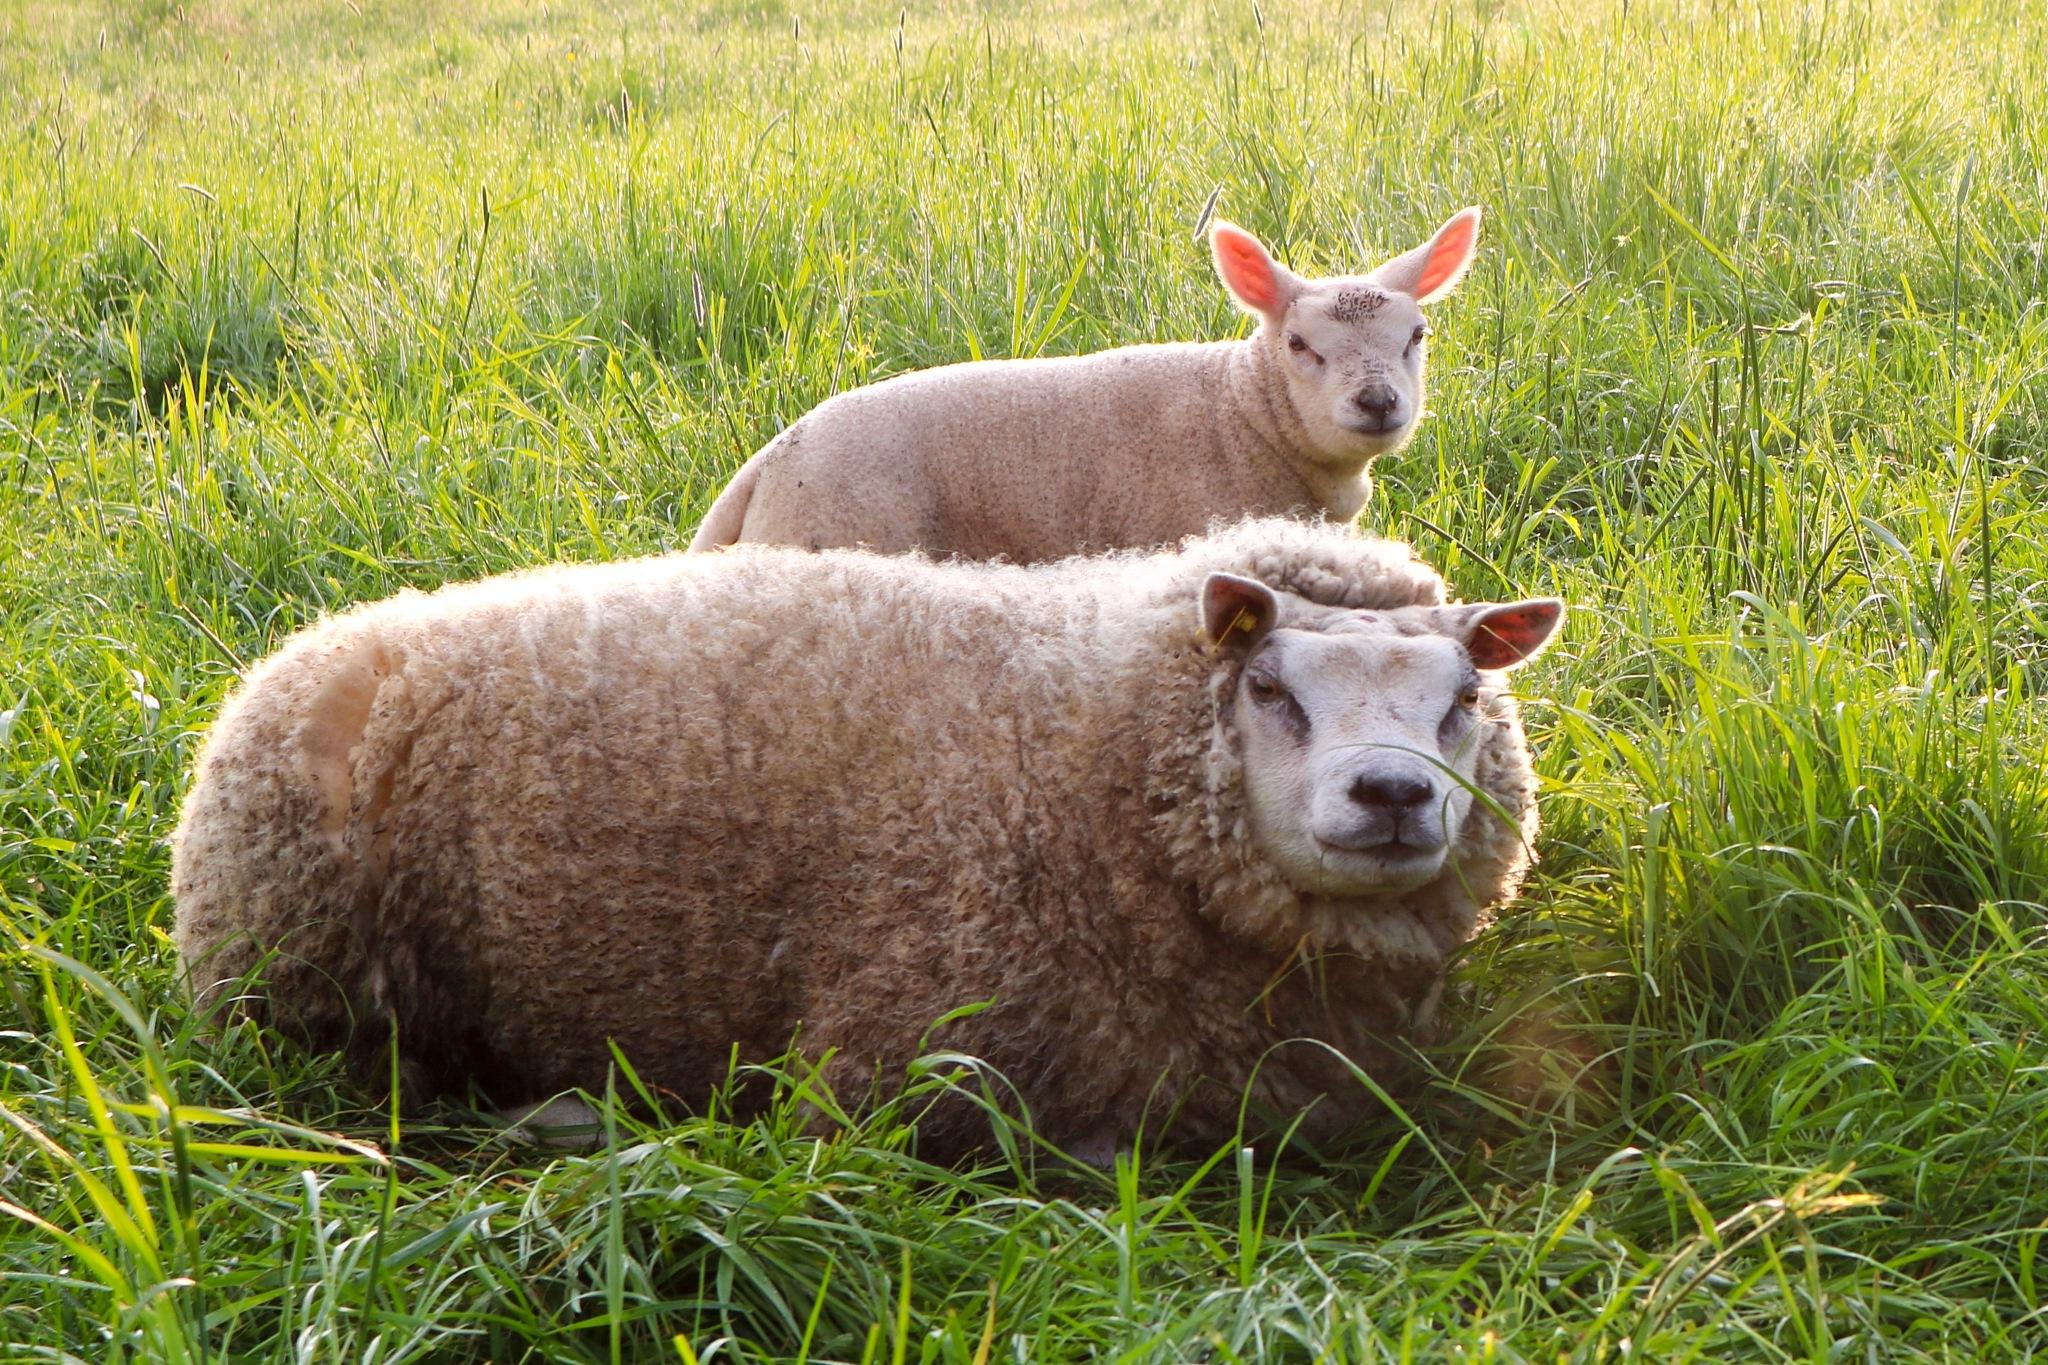 Sheep by Ivan Samoshko